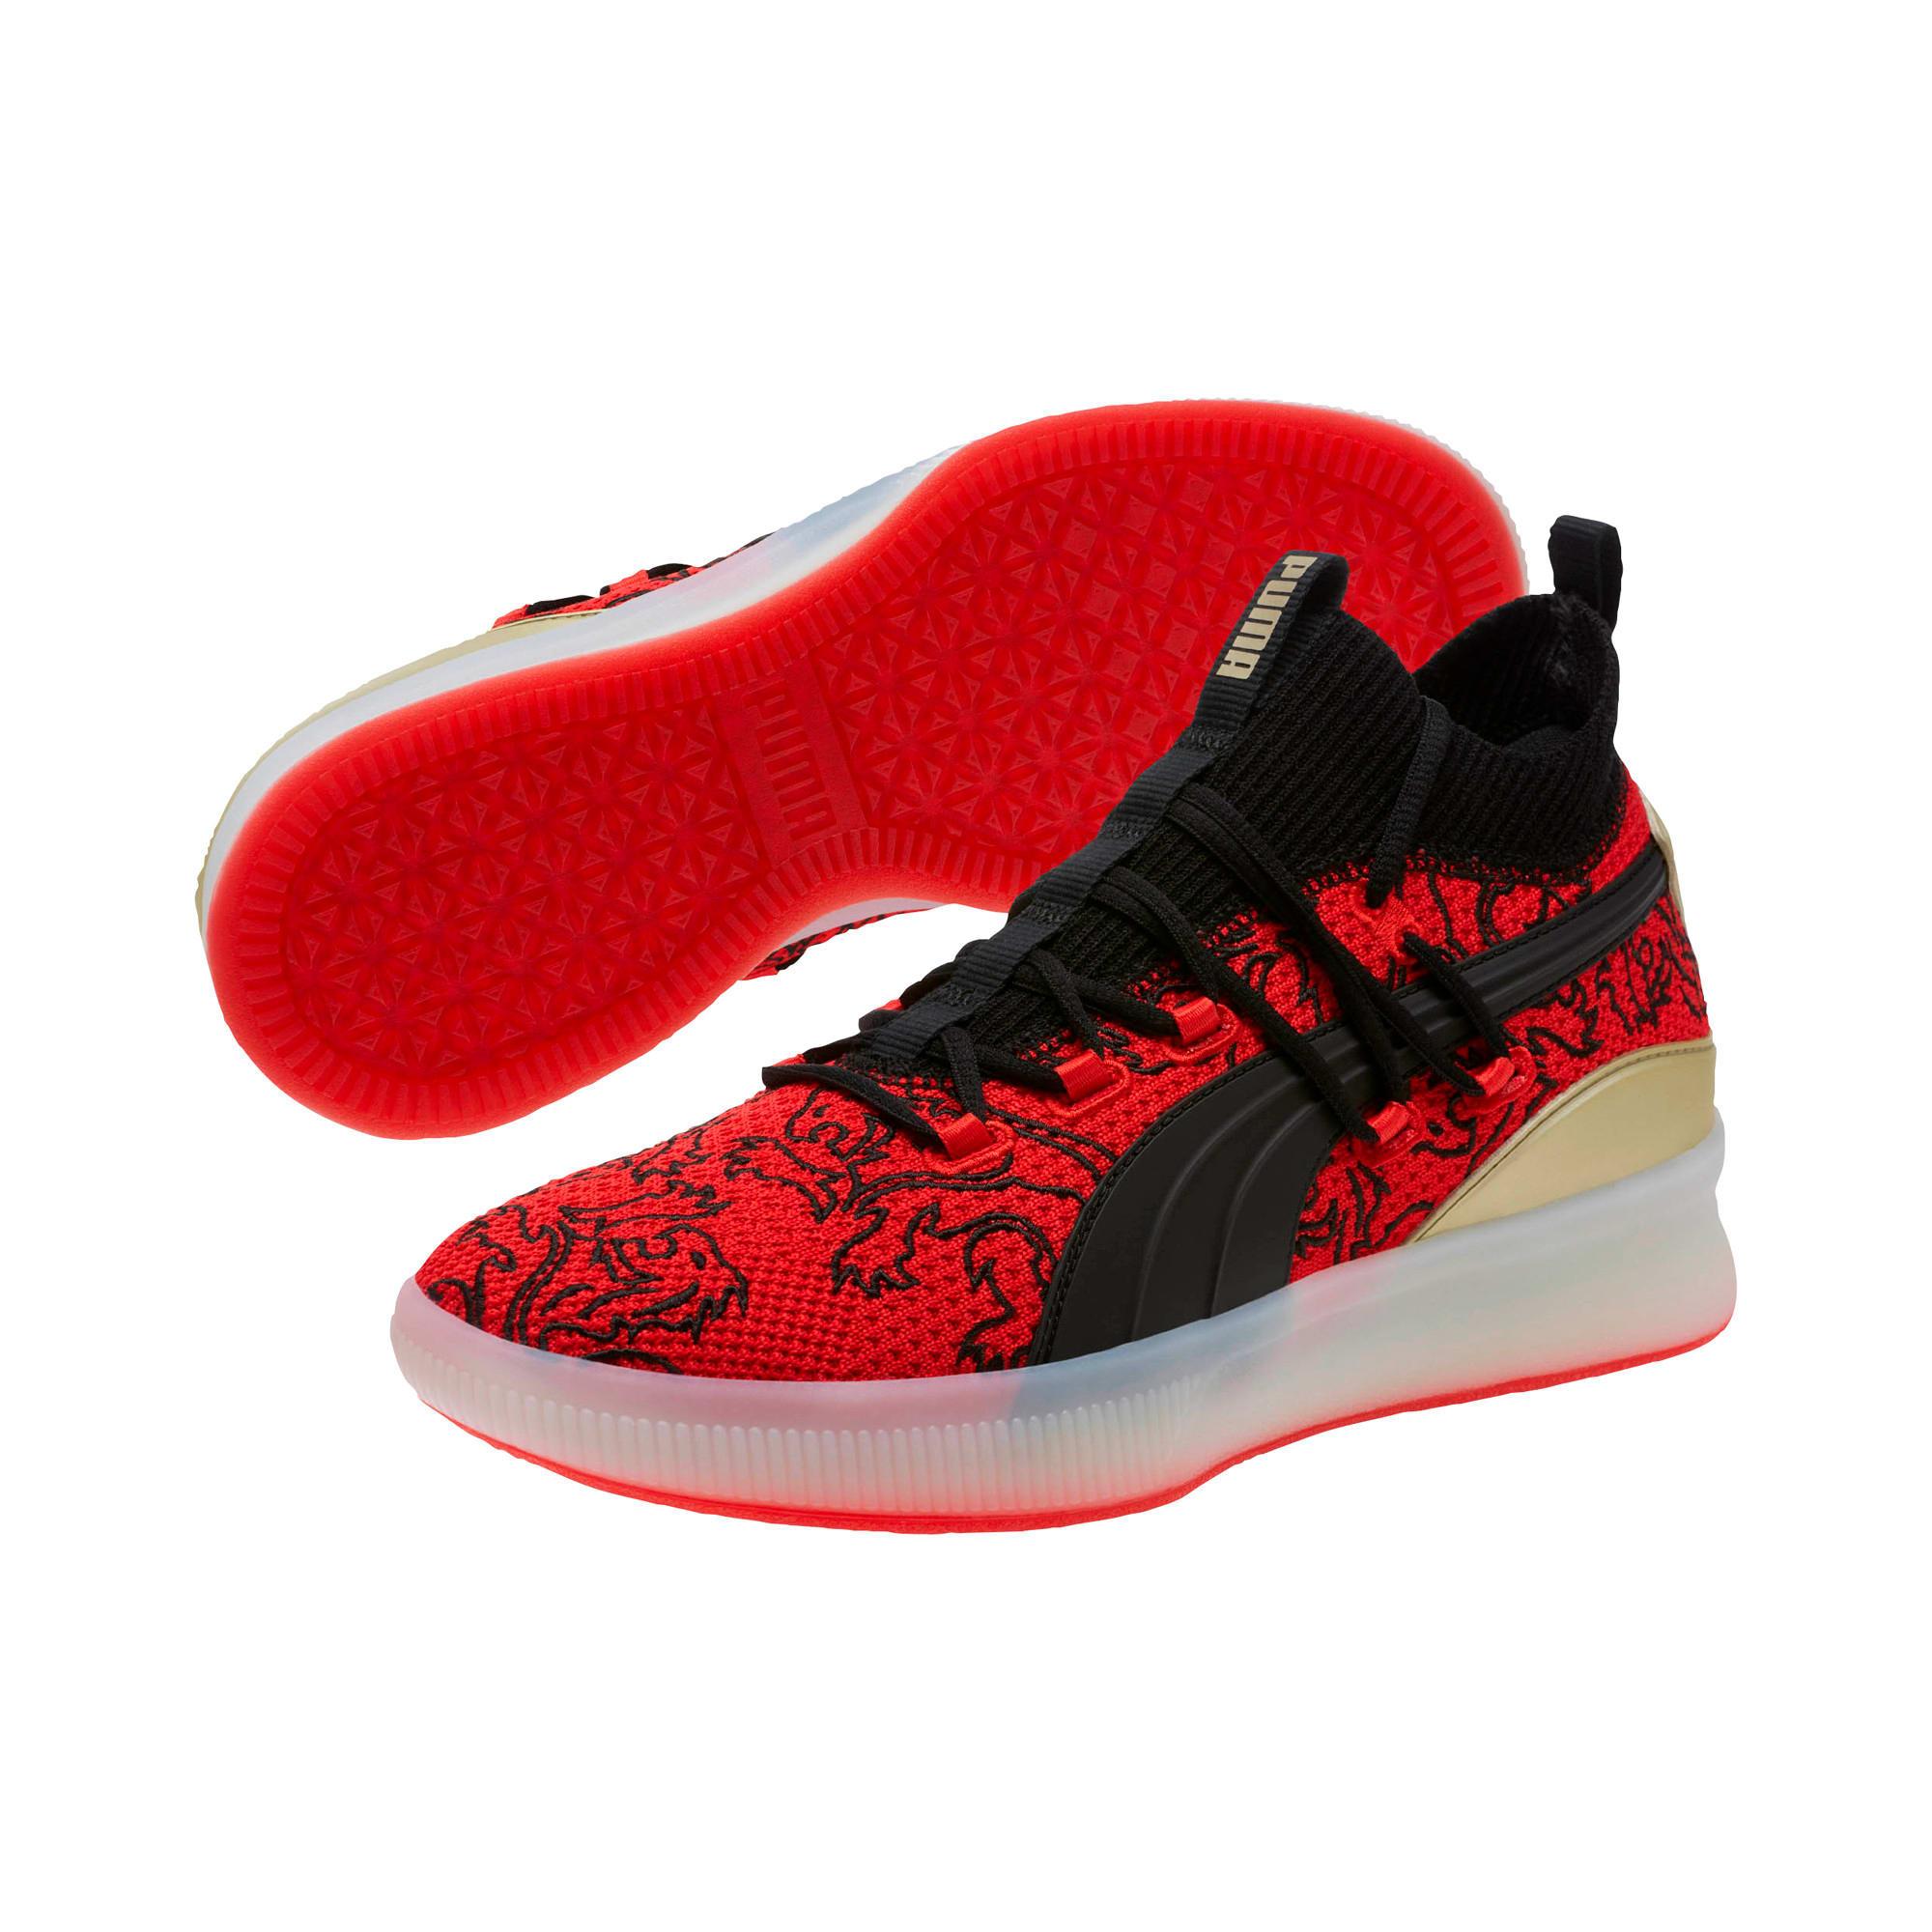 Imagen en miniatura 2 de Zapatillas de baloncesto de hombre Clyde Court London, High Risk Red-Puma Black, mediana